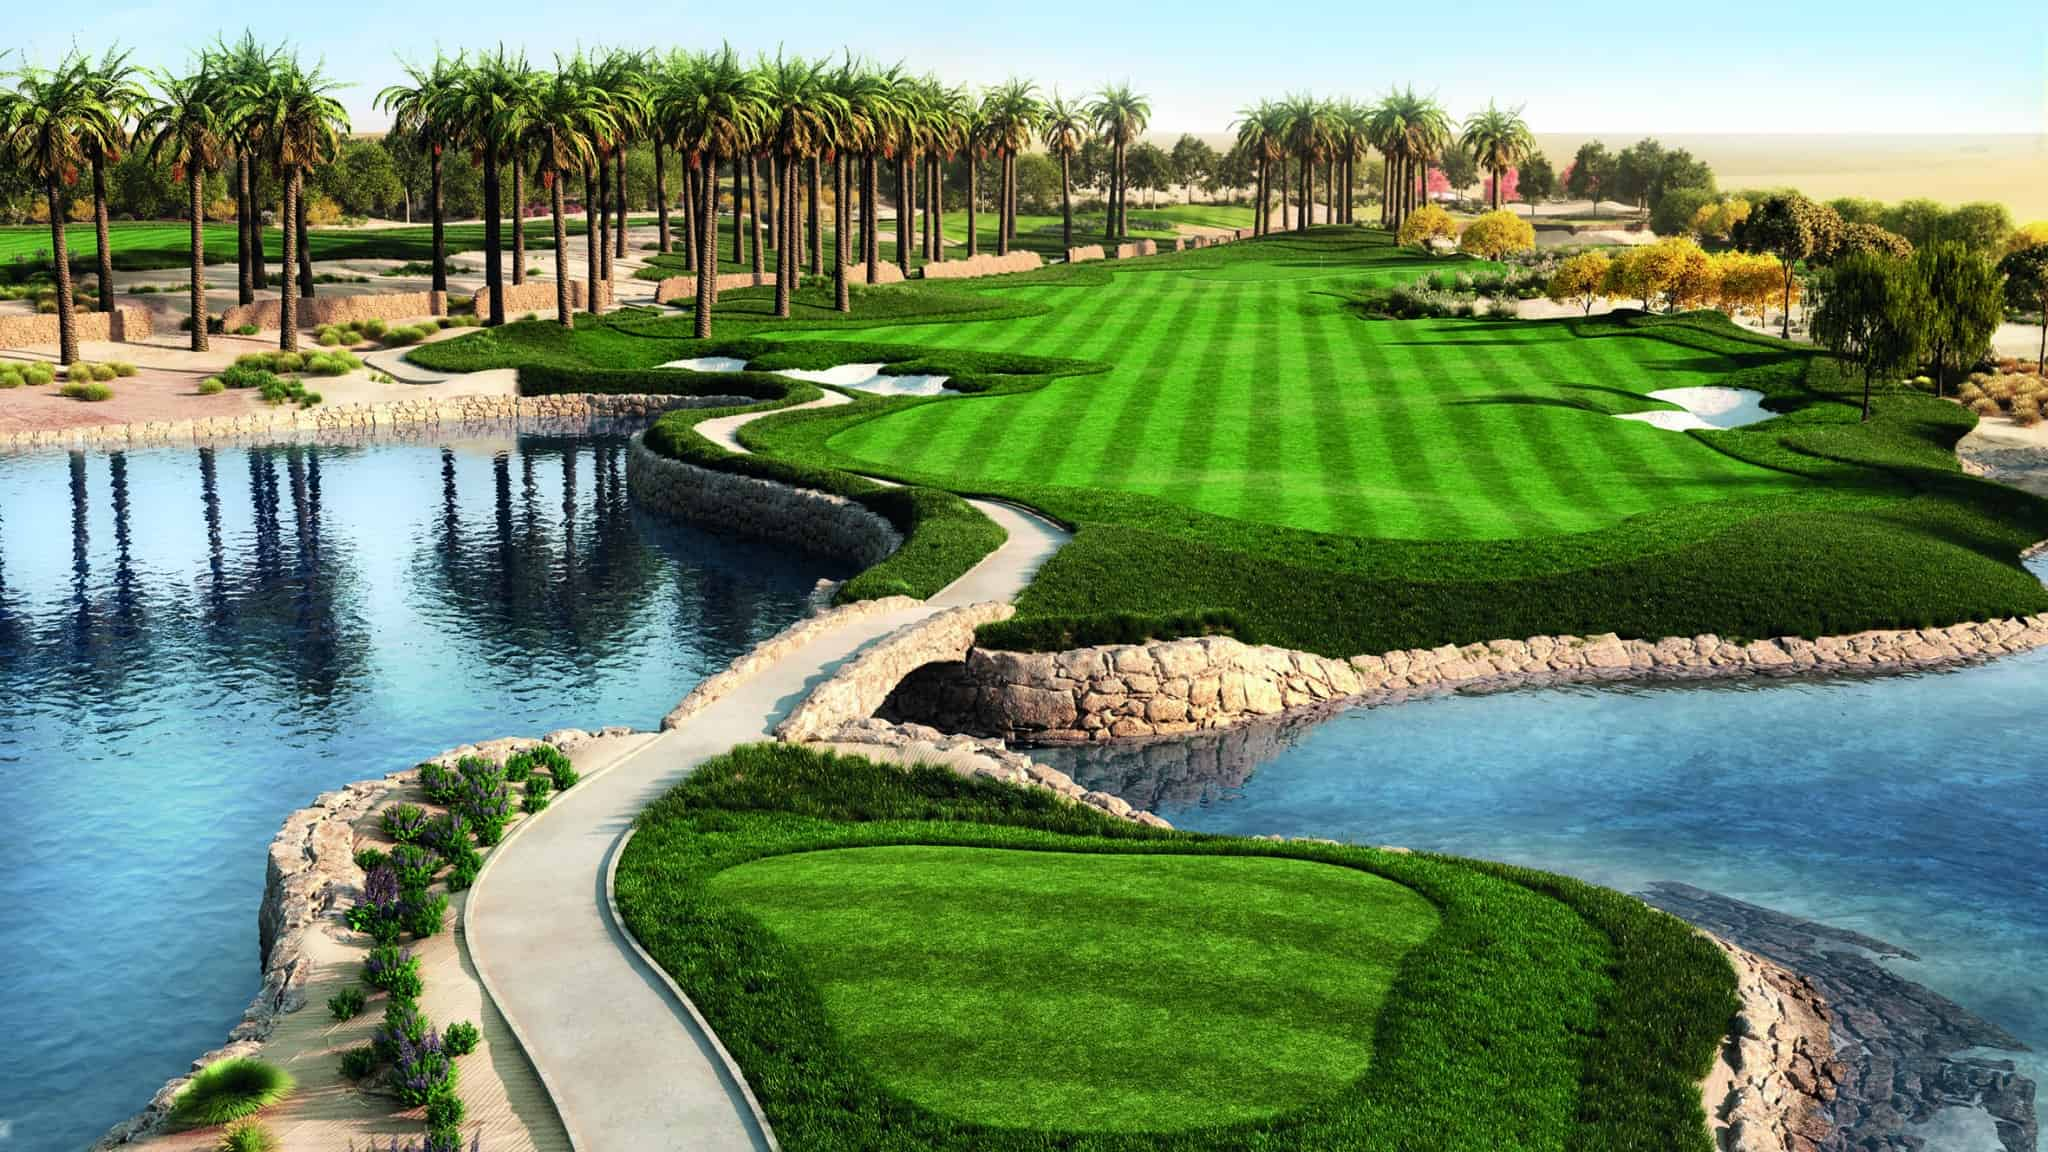 golf qatar club international course desert yardstick golfcourse tour